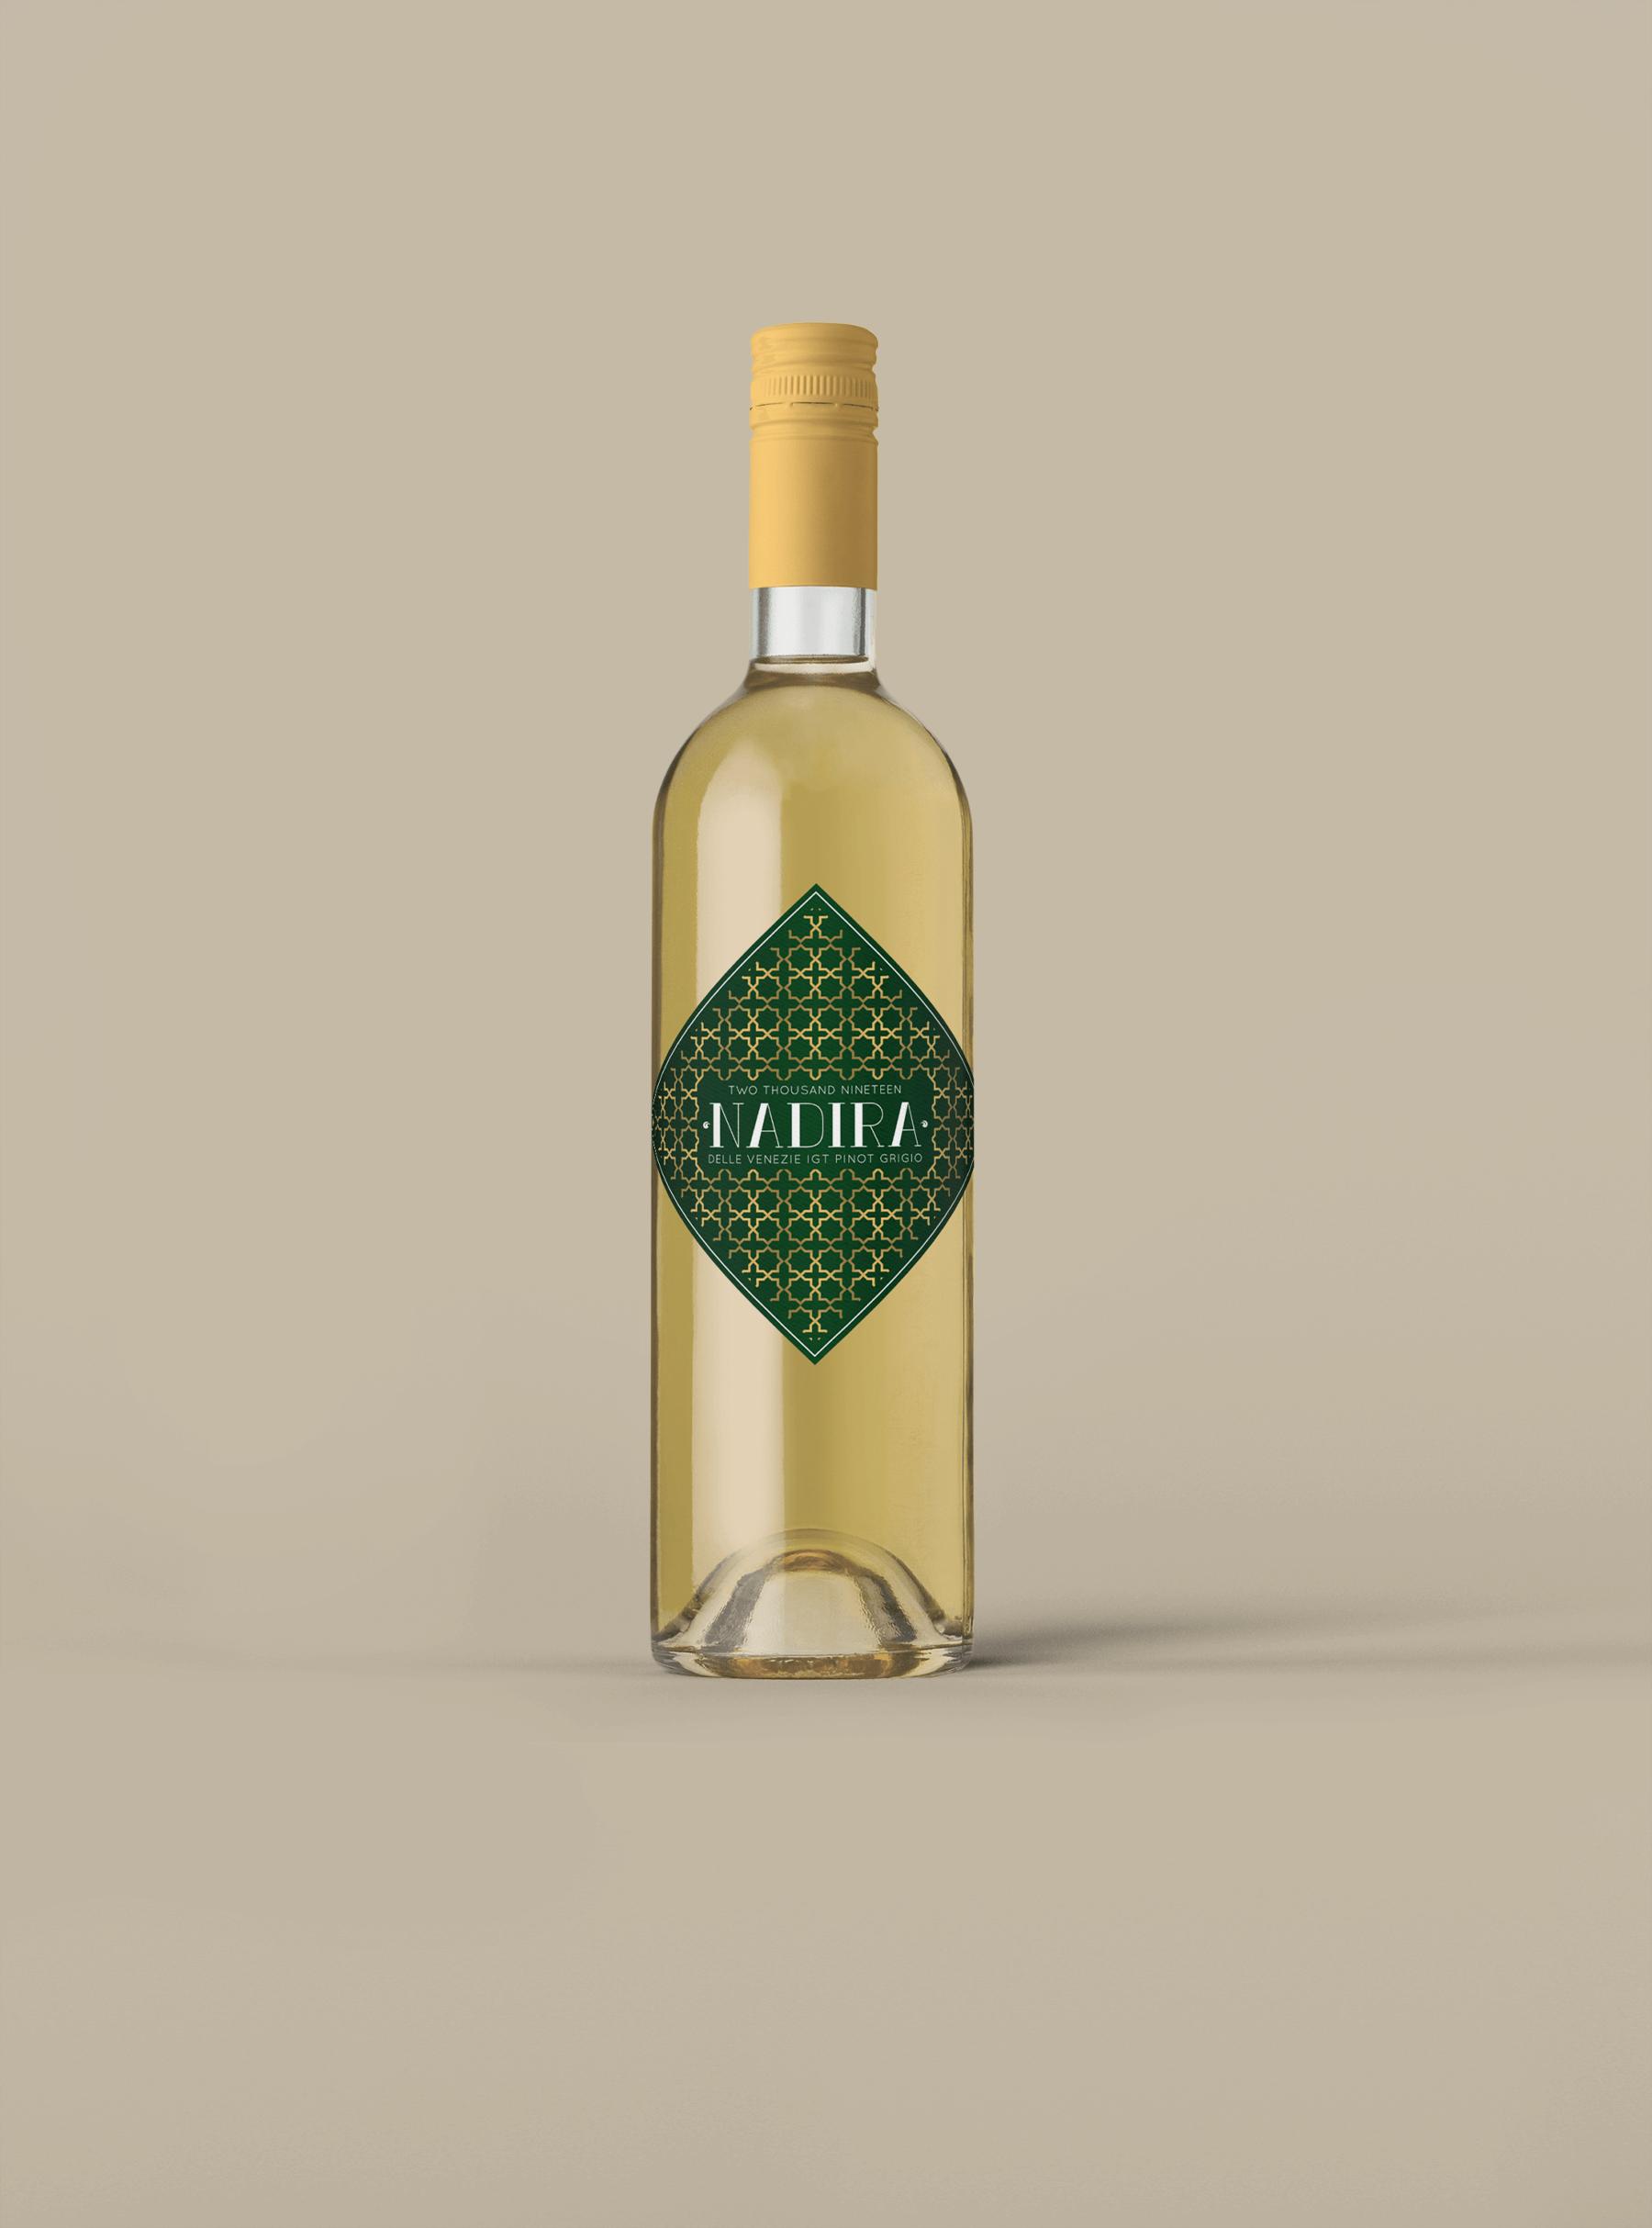 Nadira Delle Venezie IGT Pinot Grigio